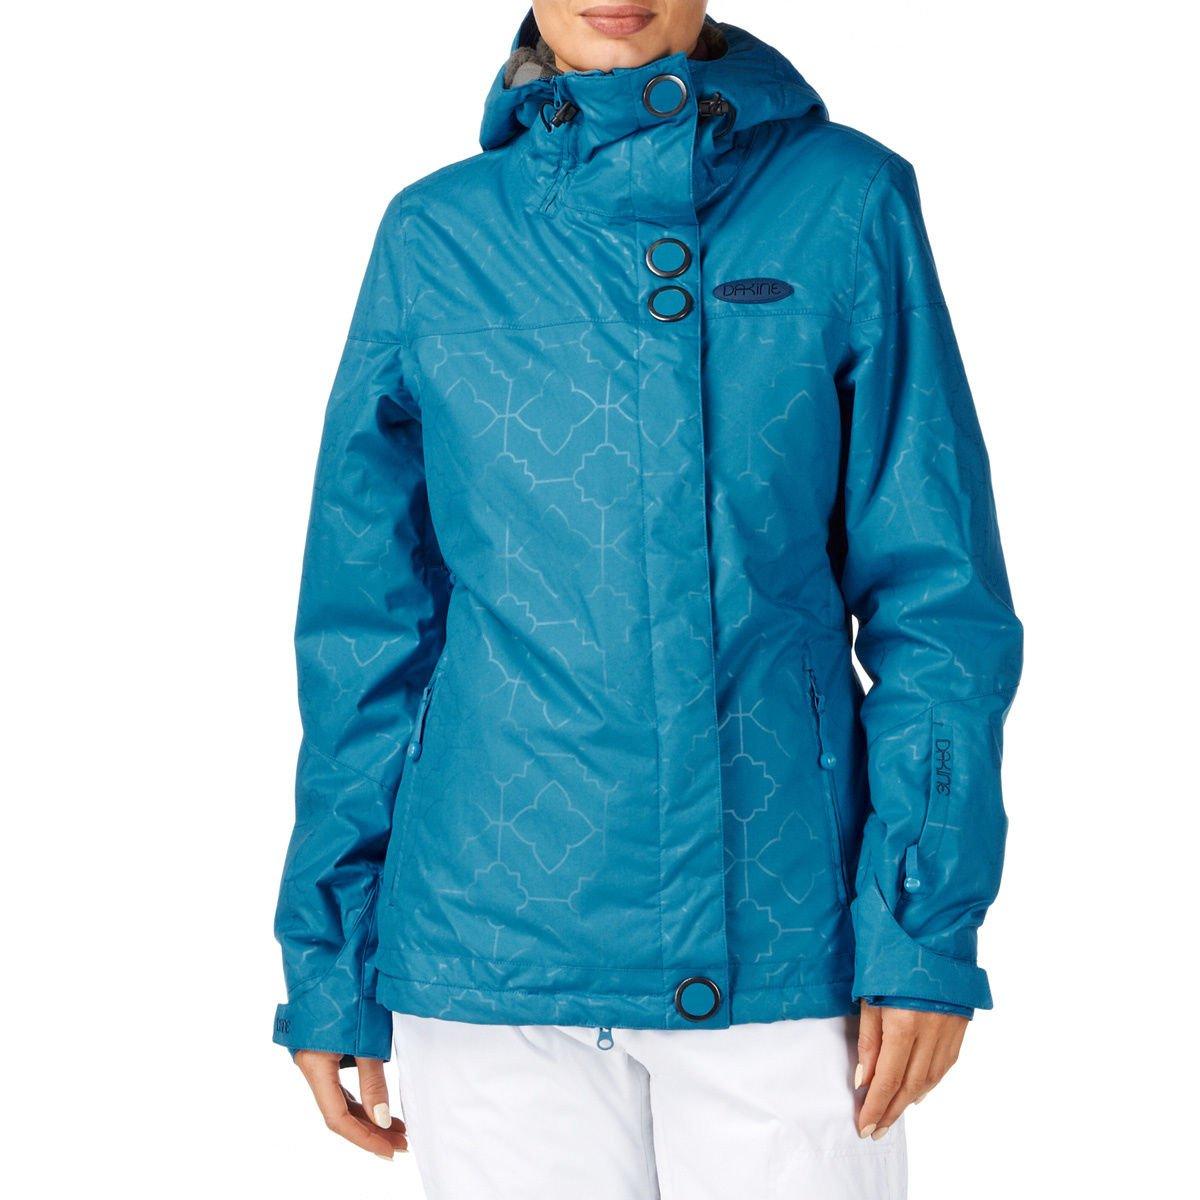 Damen Snowboard Jacke Dakine Kaitlin Jacket online bestellen